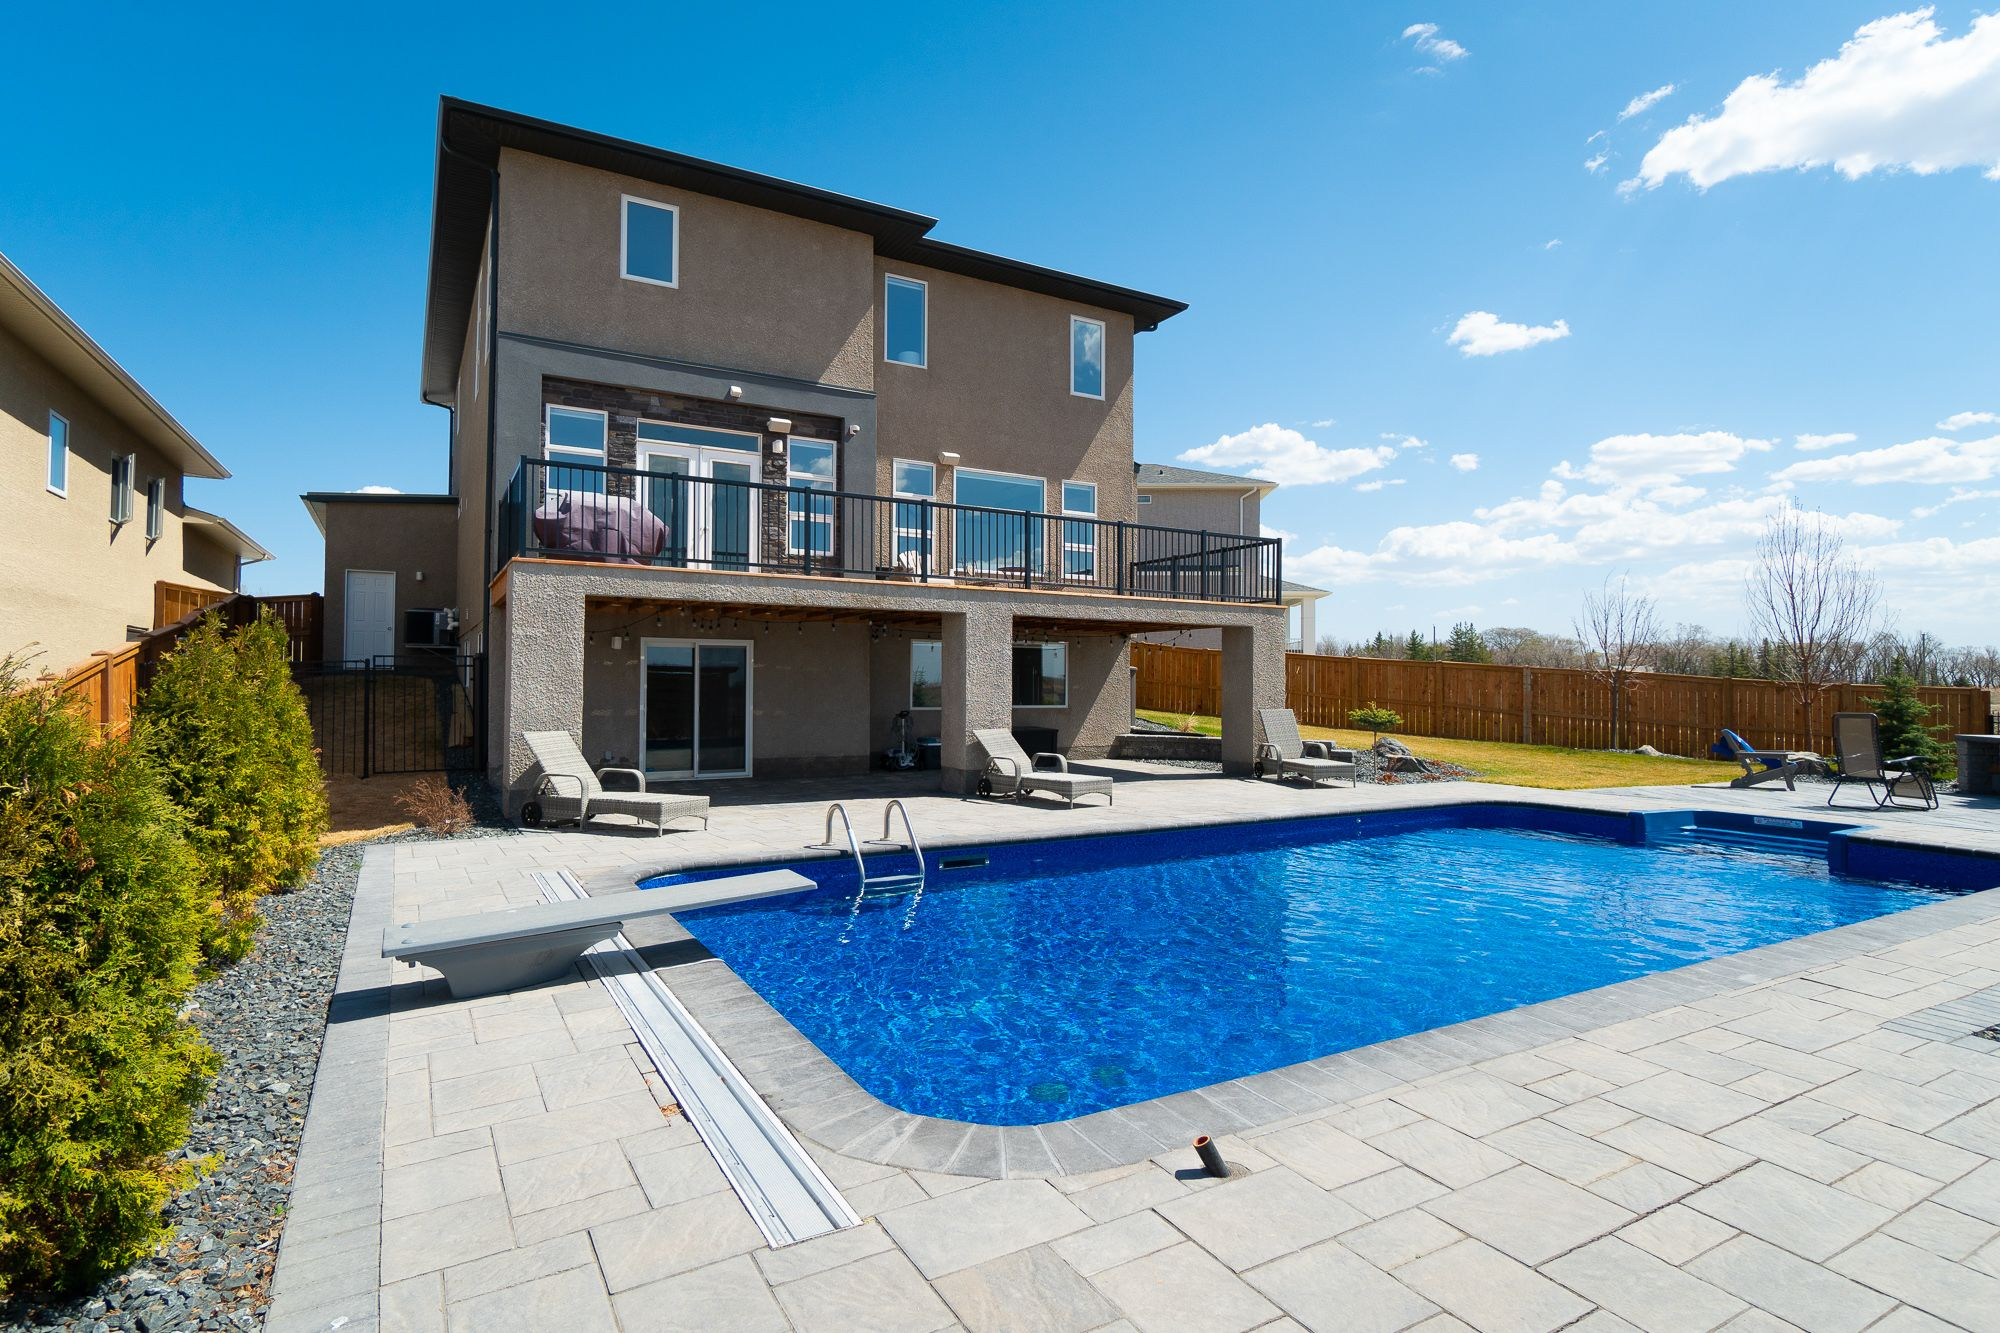 Main Photo: 131 Coneflower Crescent in Winnipeg: Sage Creek House for sale (2K)  : MLS®# 1811846